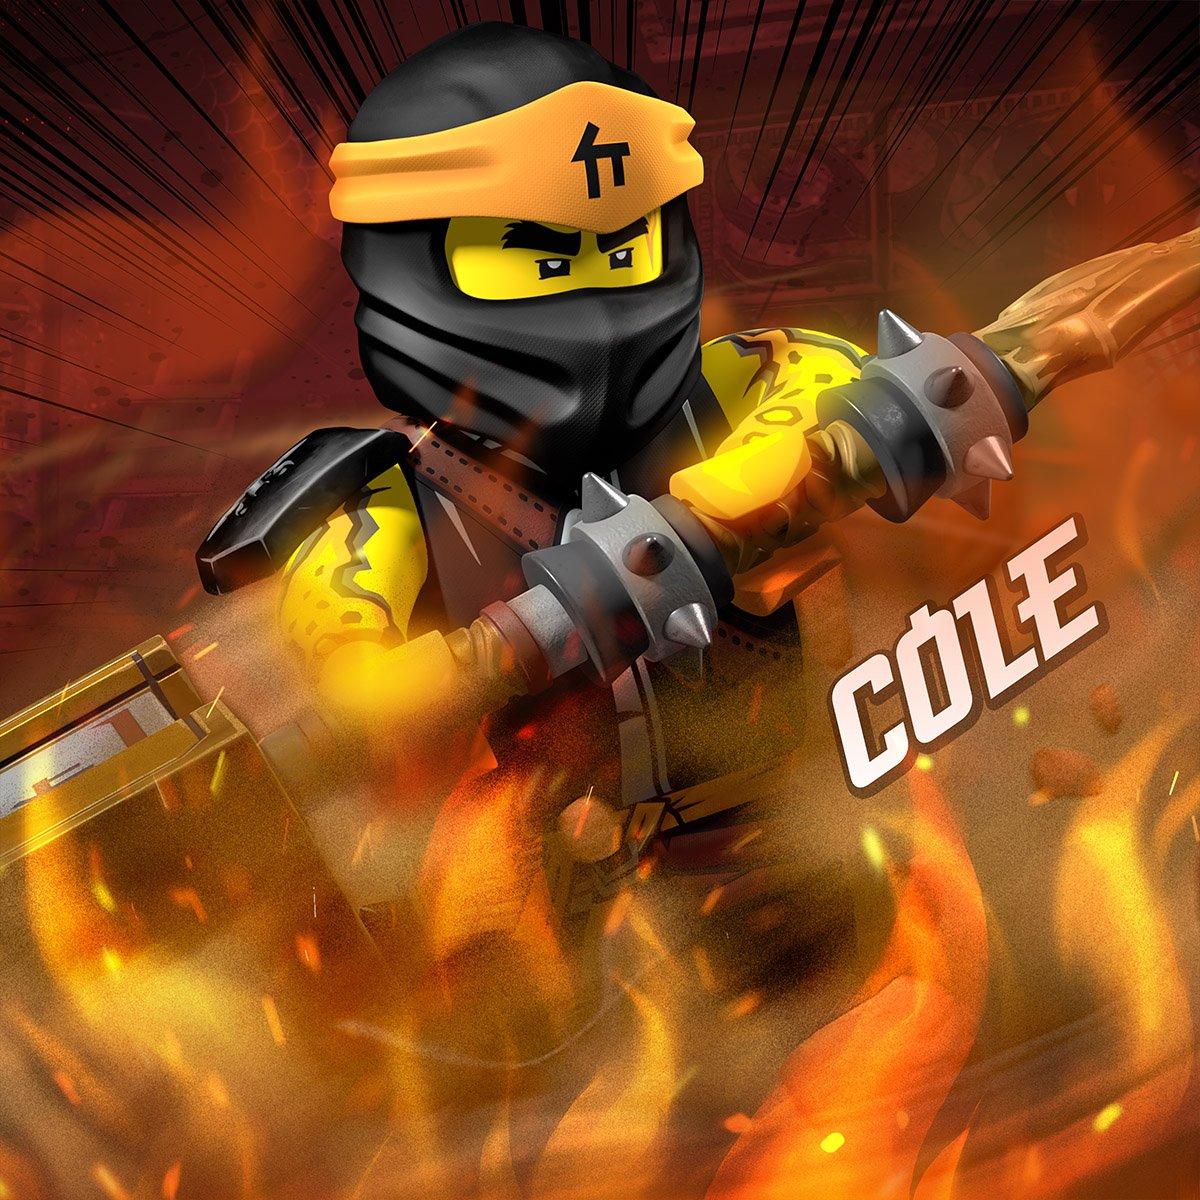 History of Cole (Secrets of the Forbidden Spinjitzu)